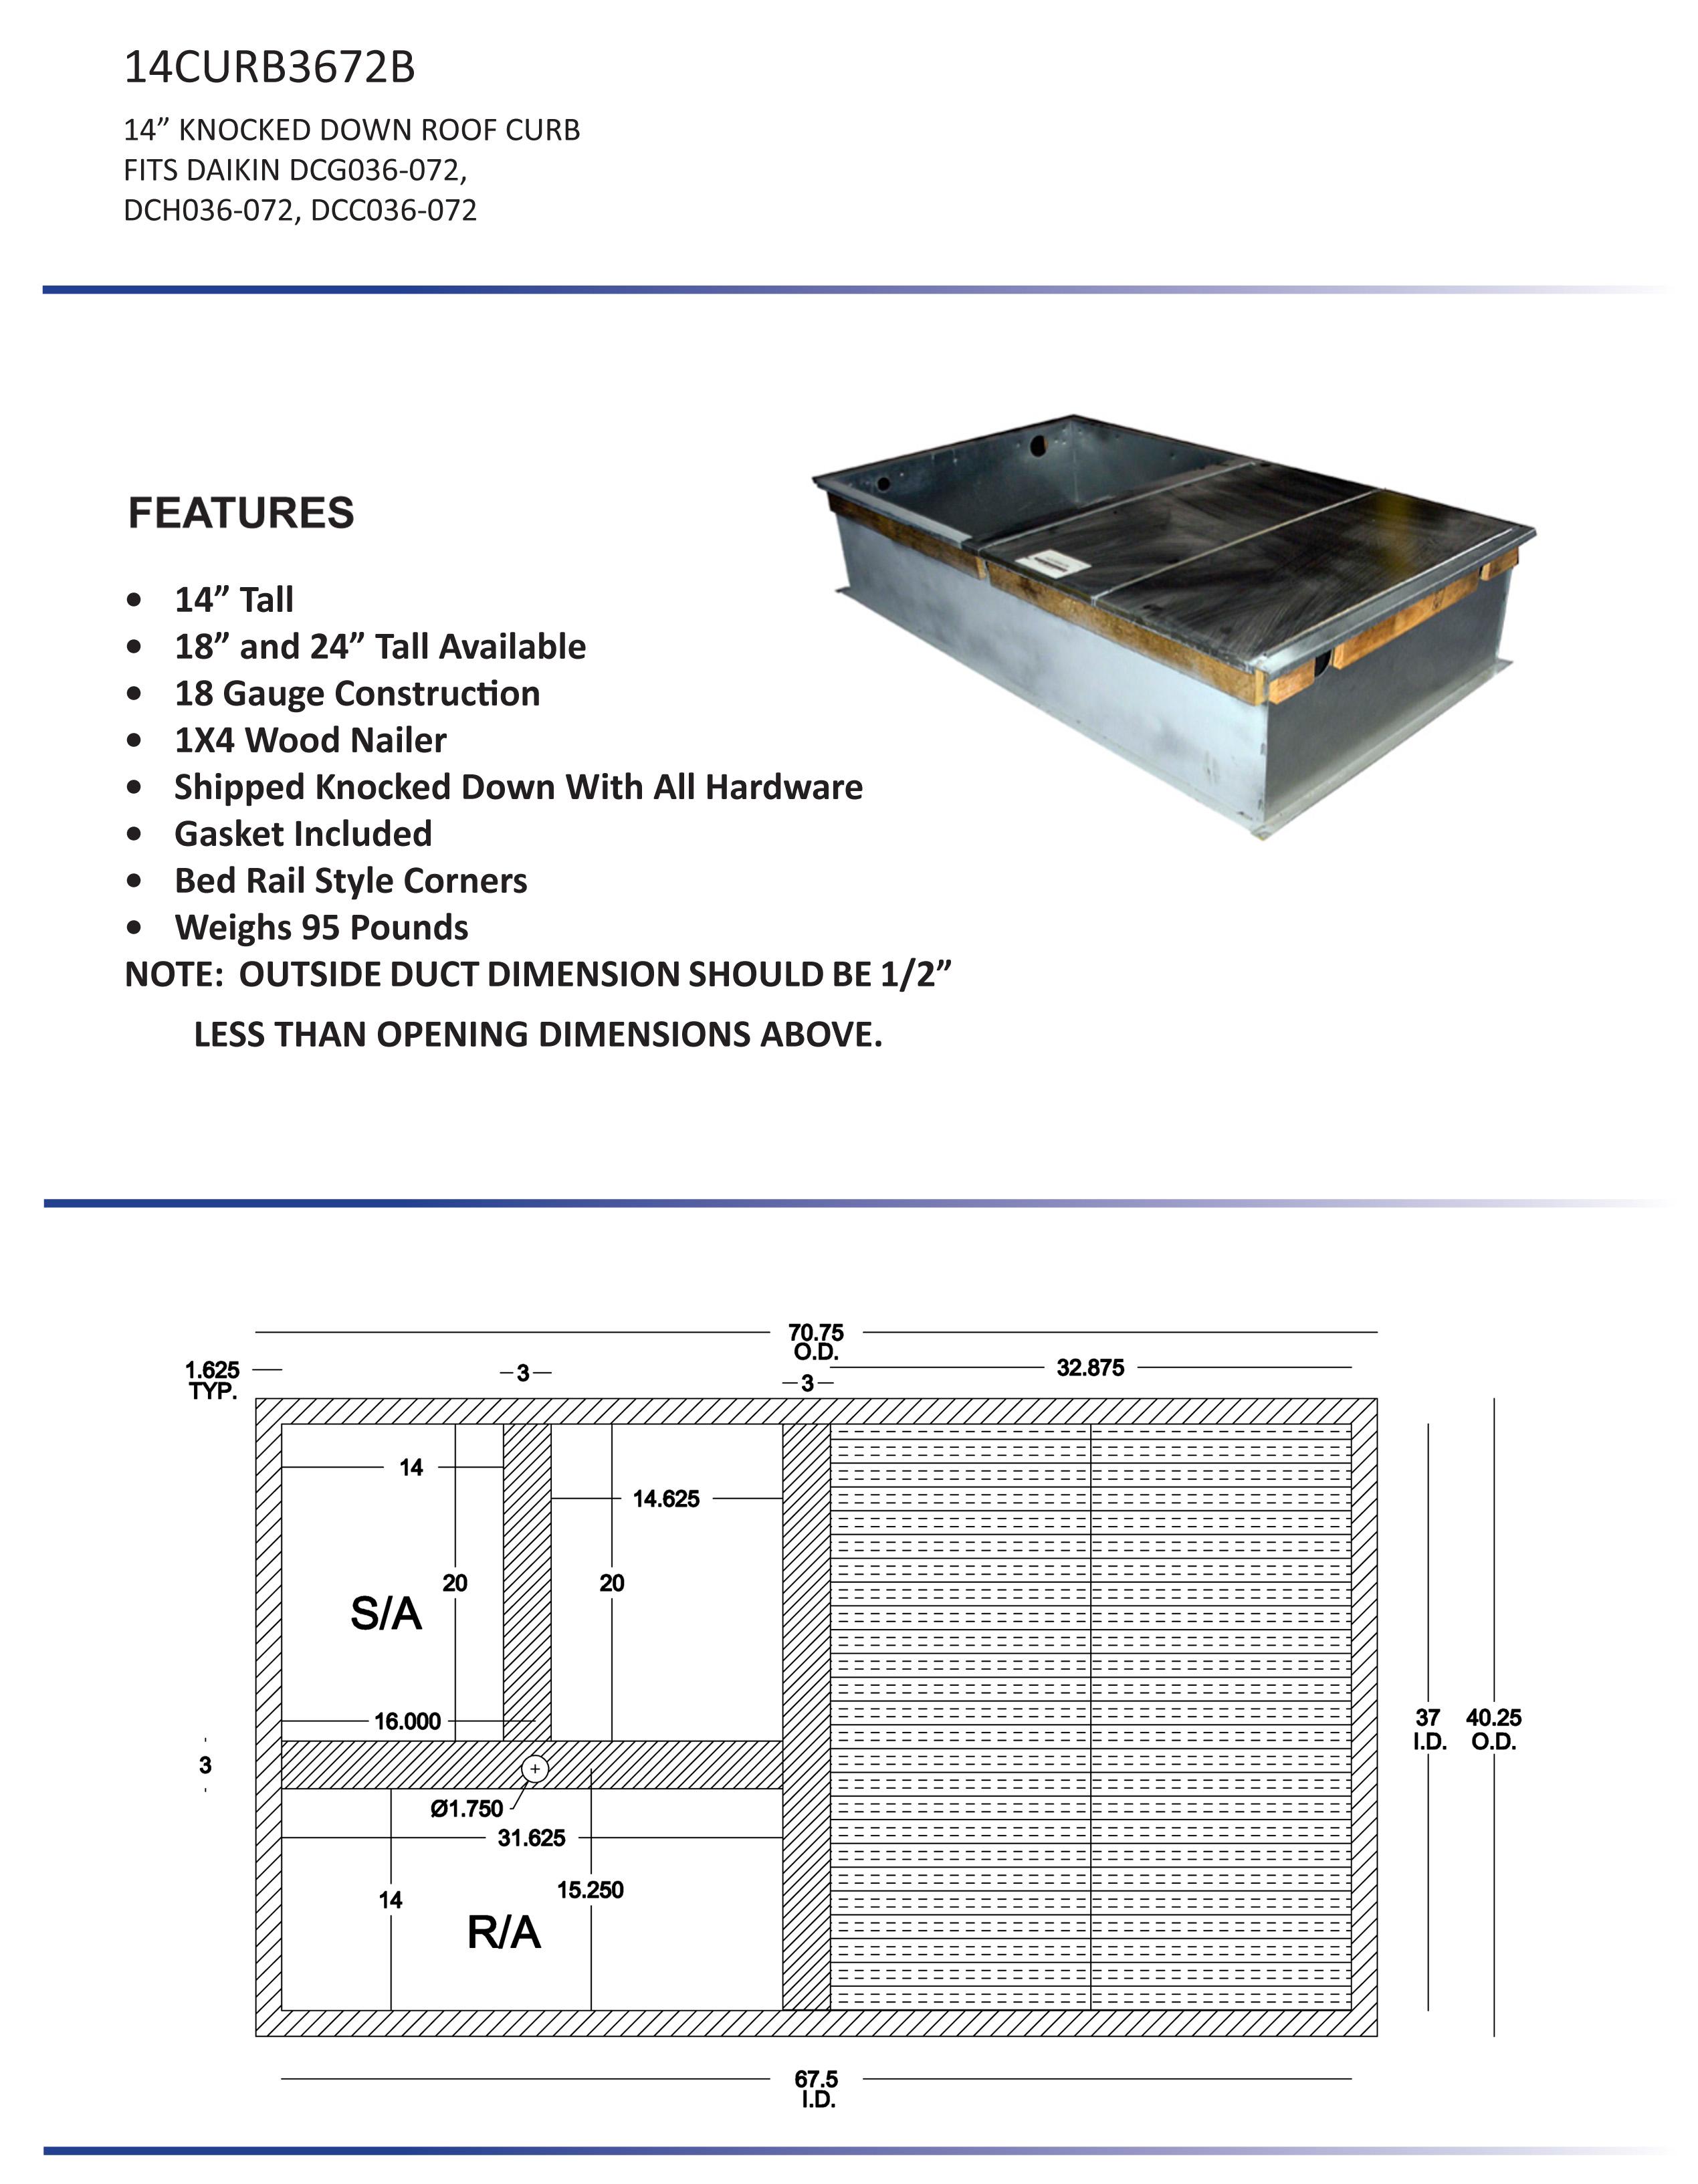 york heating and air conditioning wiring diagrams 2006 ford escape door ajar diagram 3-6 ton daikin 14